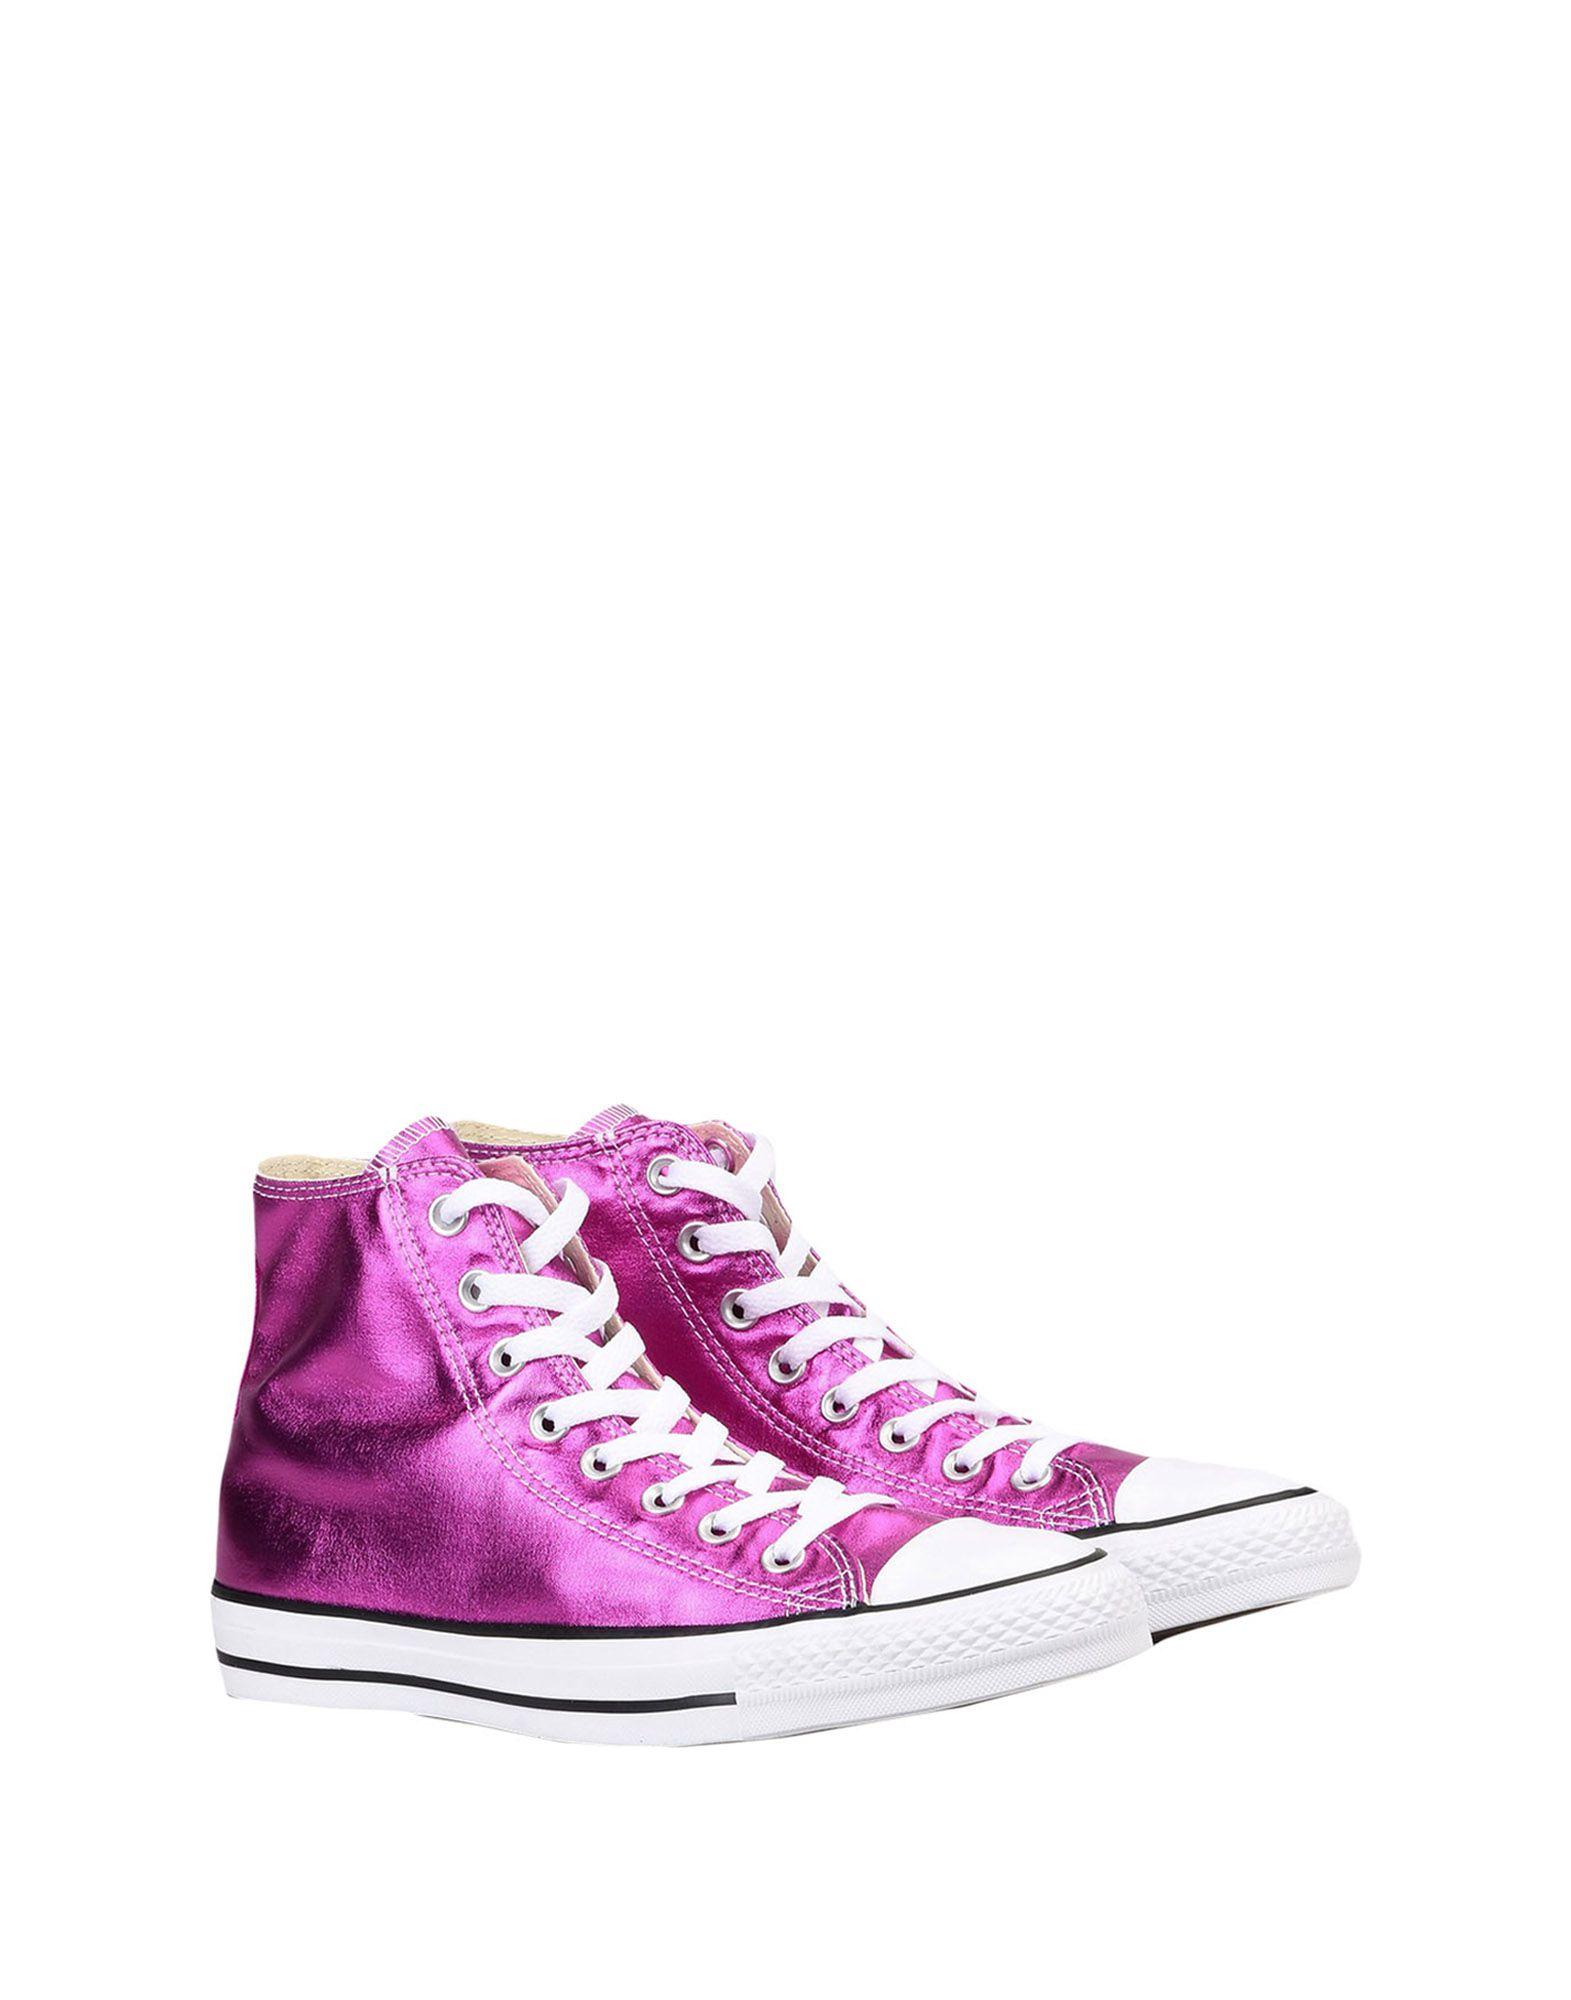 Converse All Star Ct As Hi Canvas Metallic  11273097QD Gute Qualität beliebte Schuhe